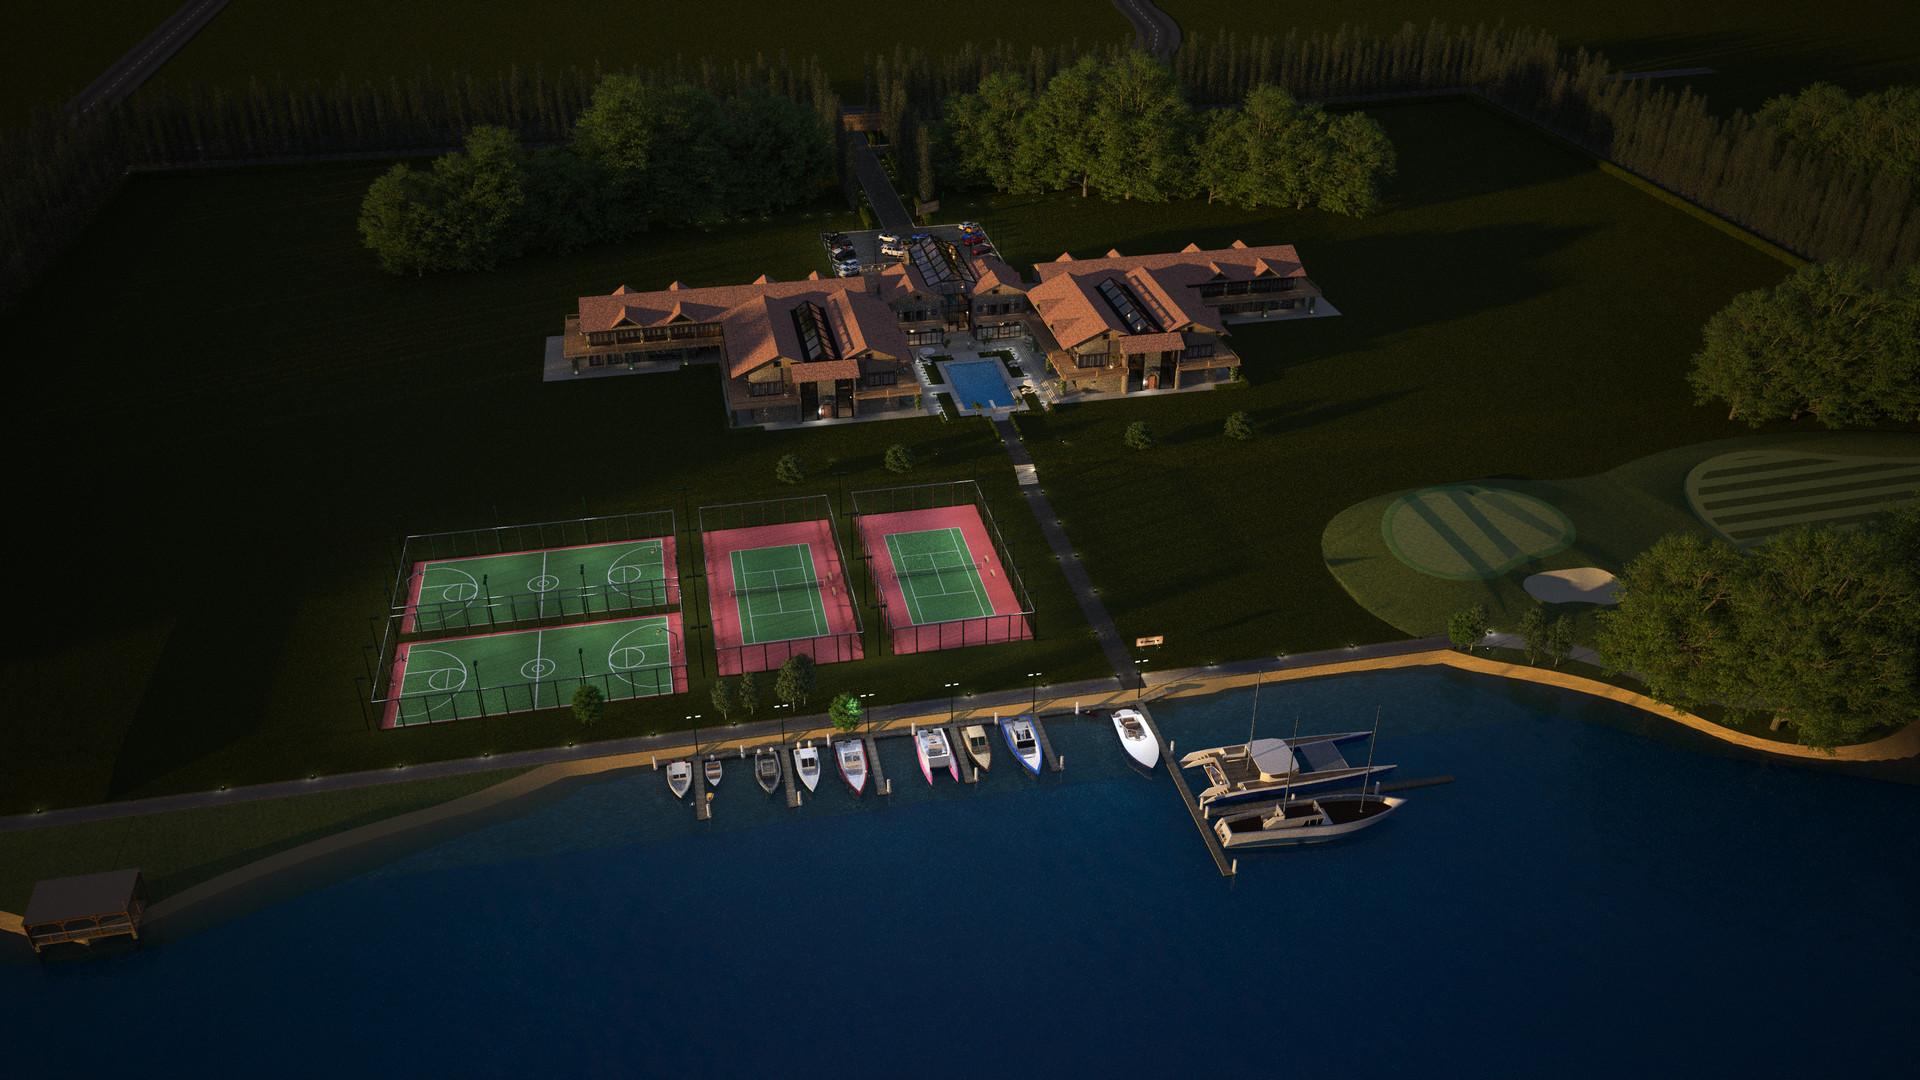 Duane kemp lake arial to center ne dusk 01